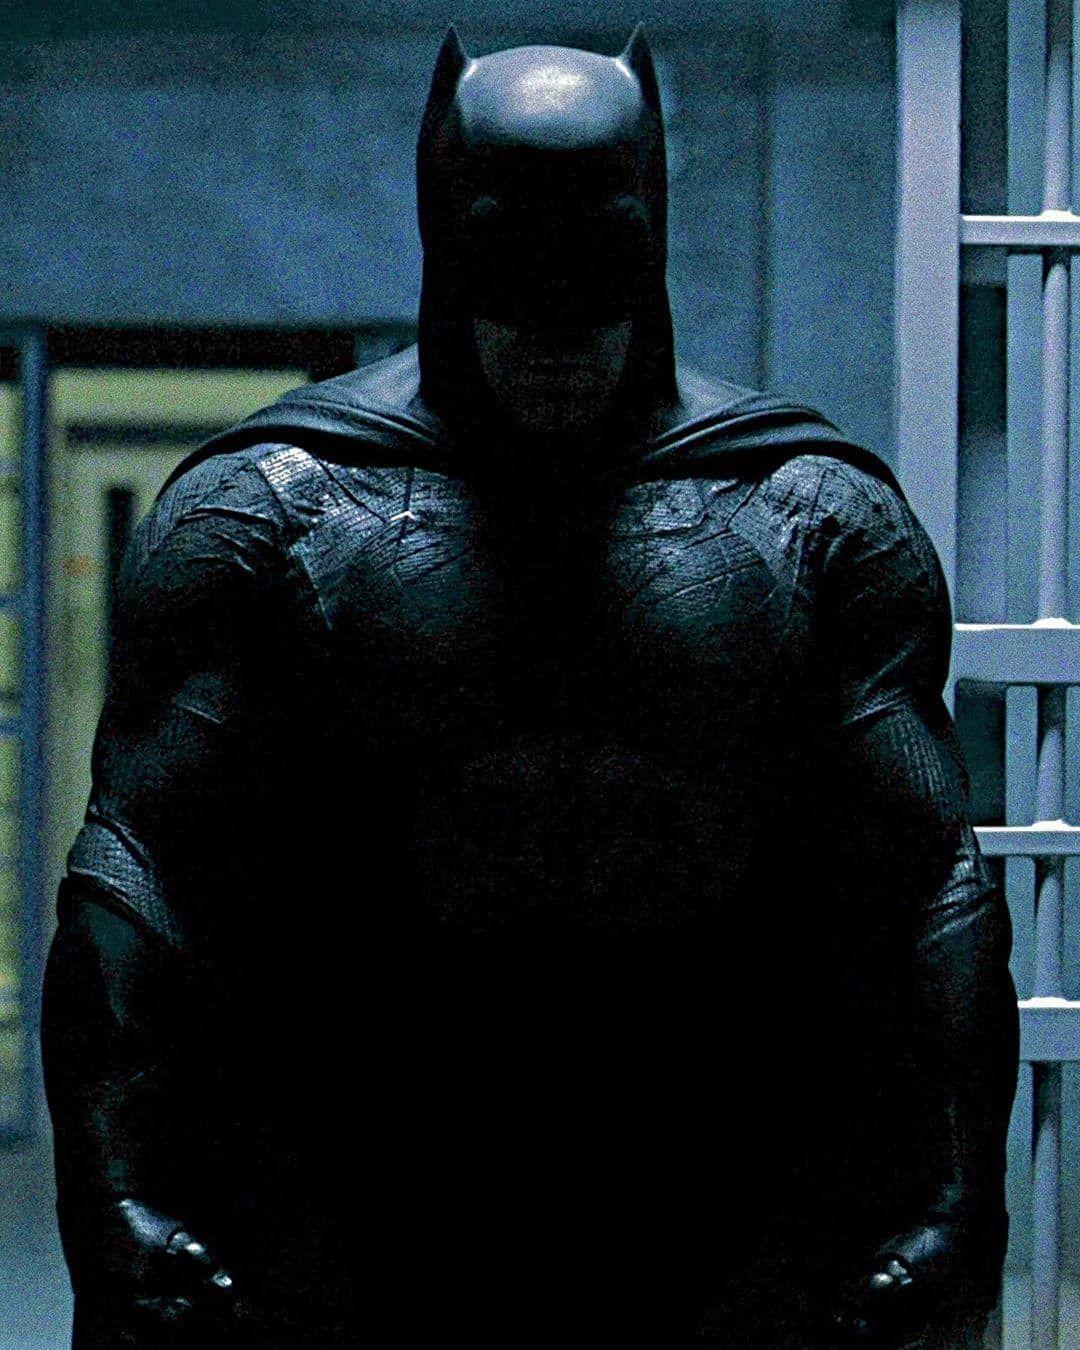 The Batman Shared A Post On Instagram Whatever You Do Wherever You Go I Will Be Watching You Benaffleck Foll Keaton Batman Batman Ben Affleck Batman